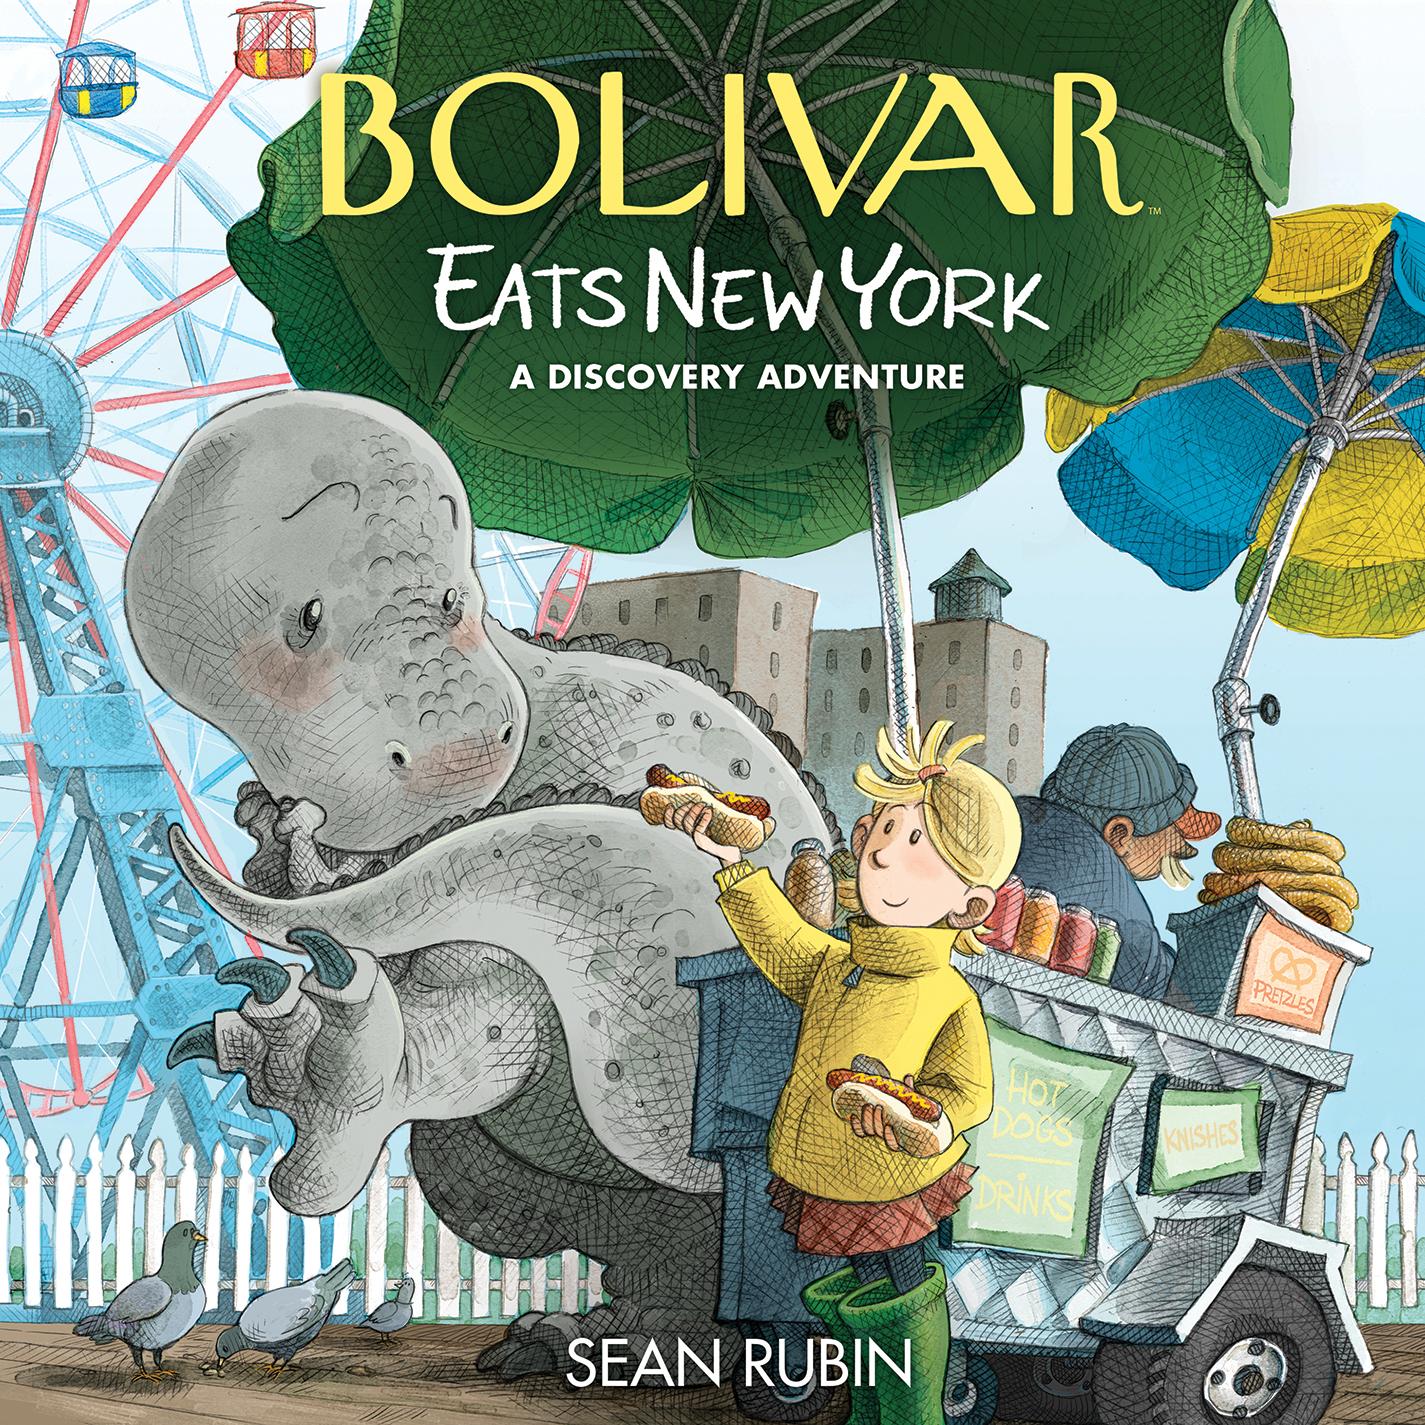 BOLIVAR EATS NEW YORK: A DISCOVERY ADVENTURE HC